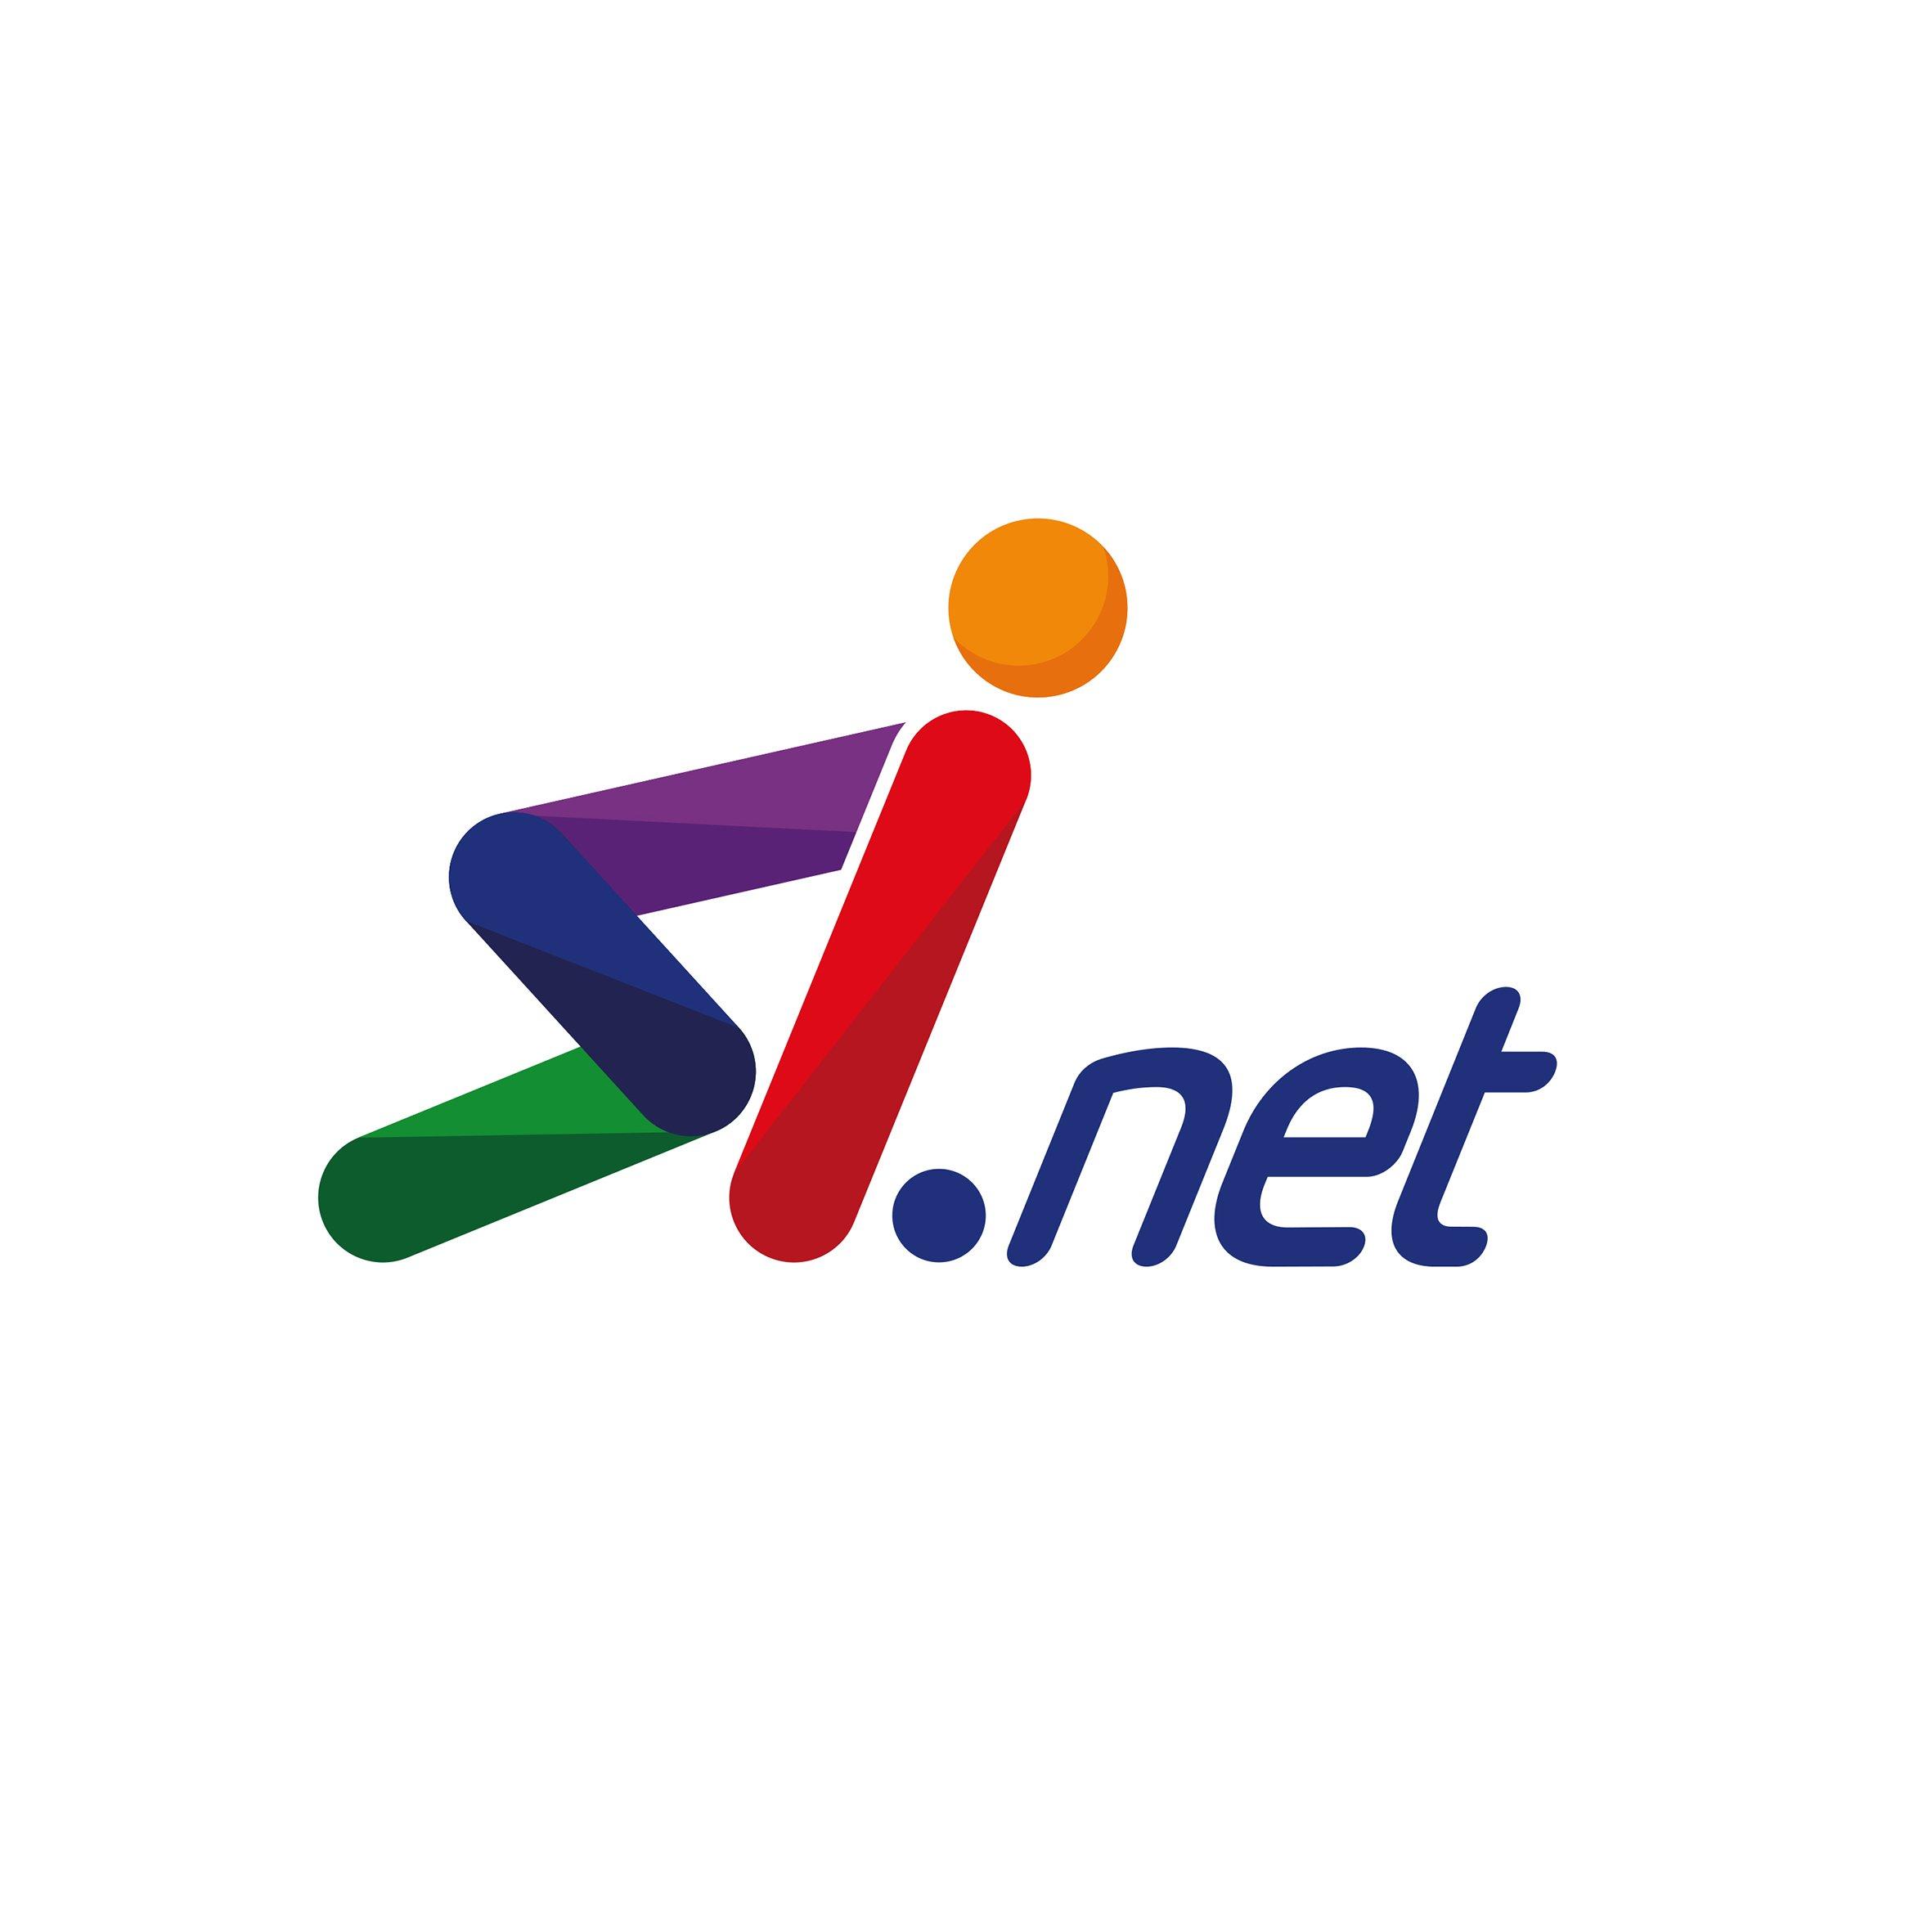 logo sinet_2